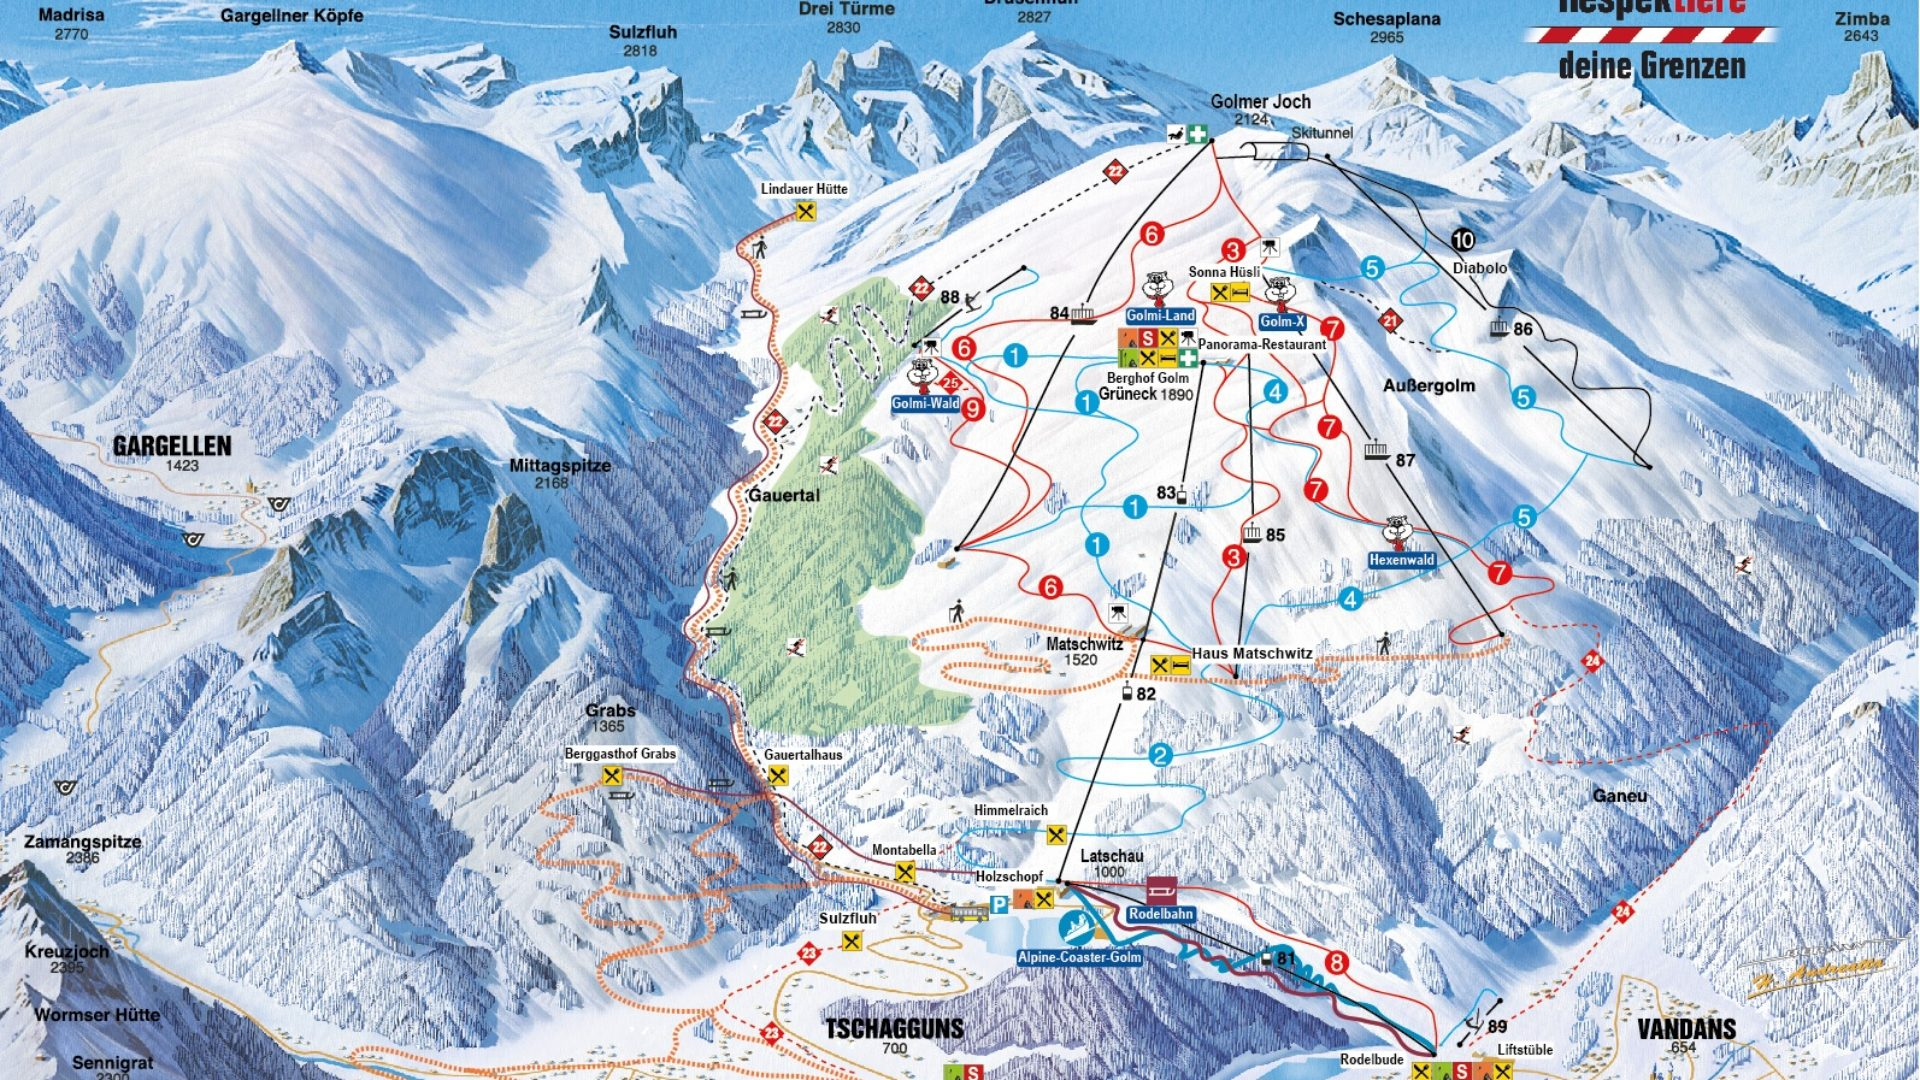 Gesperrte skigebiete